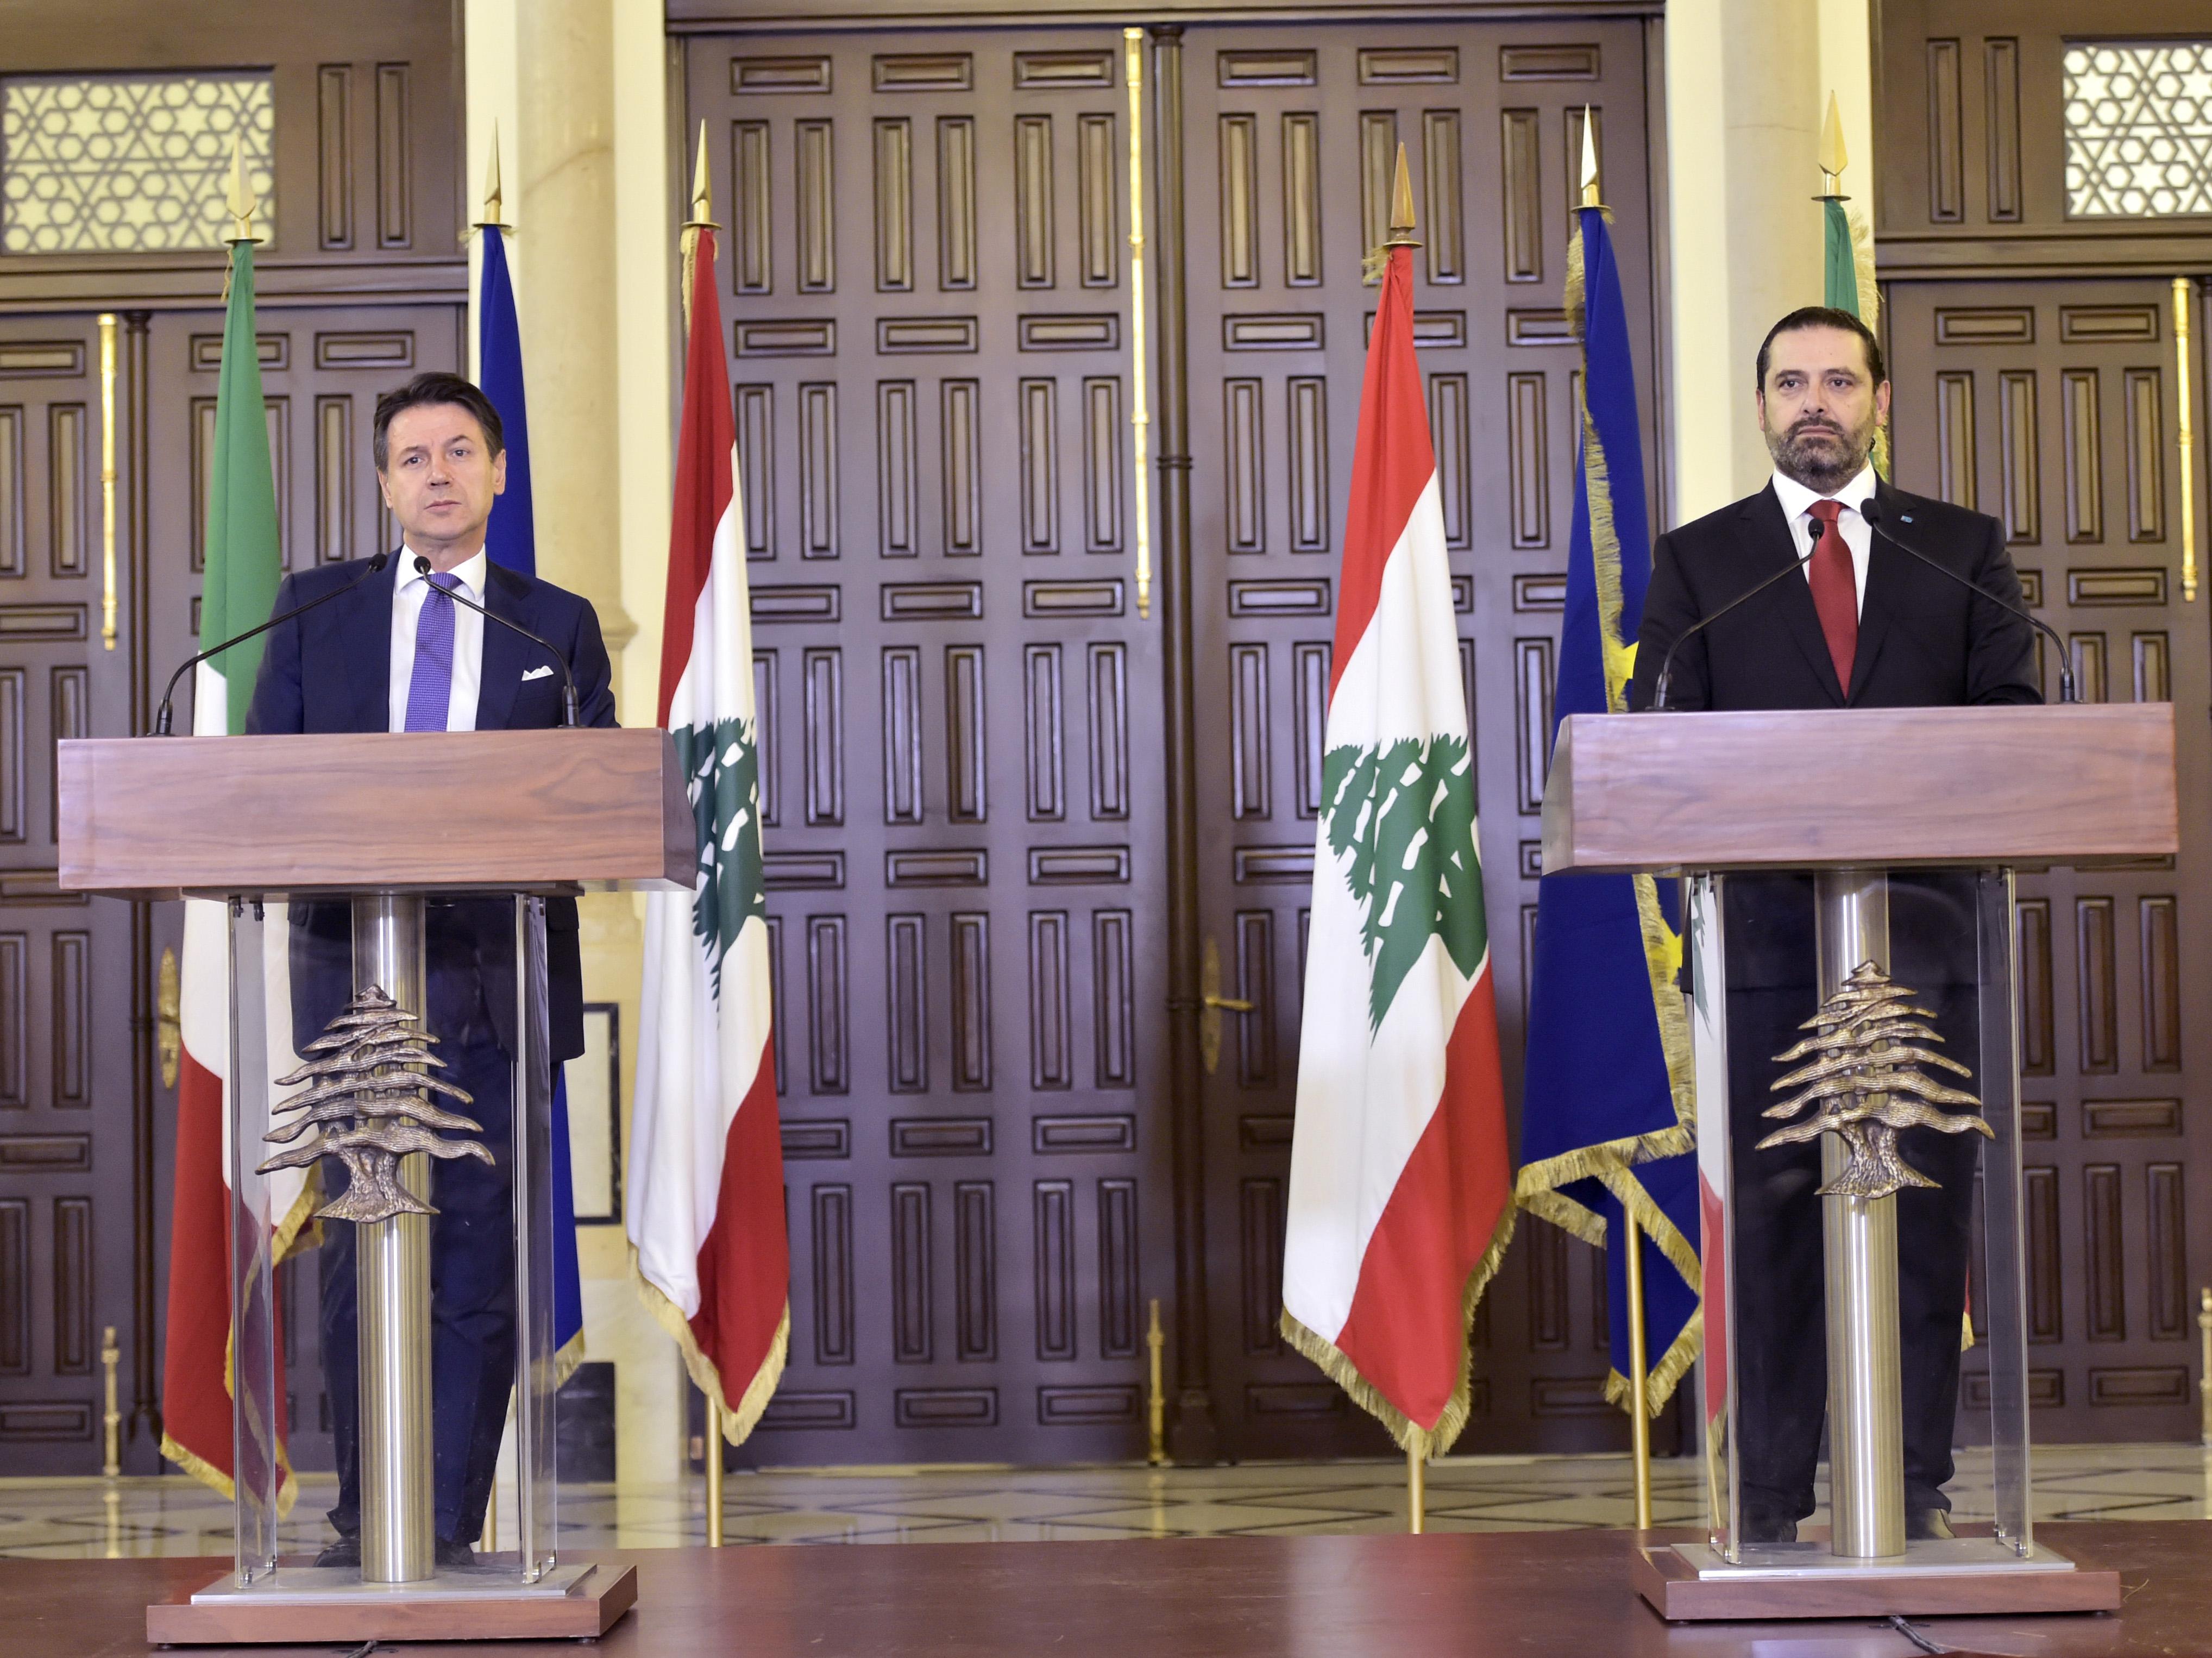 Pr Minister Saad Hariri Receiving Italian Pr Minister 4